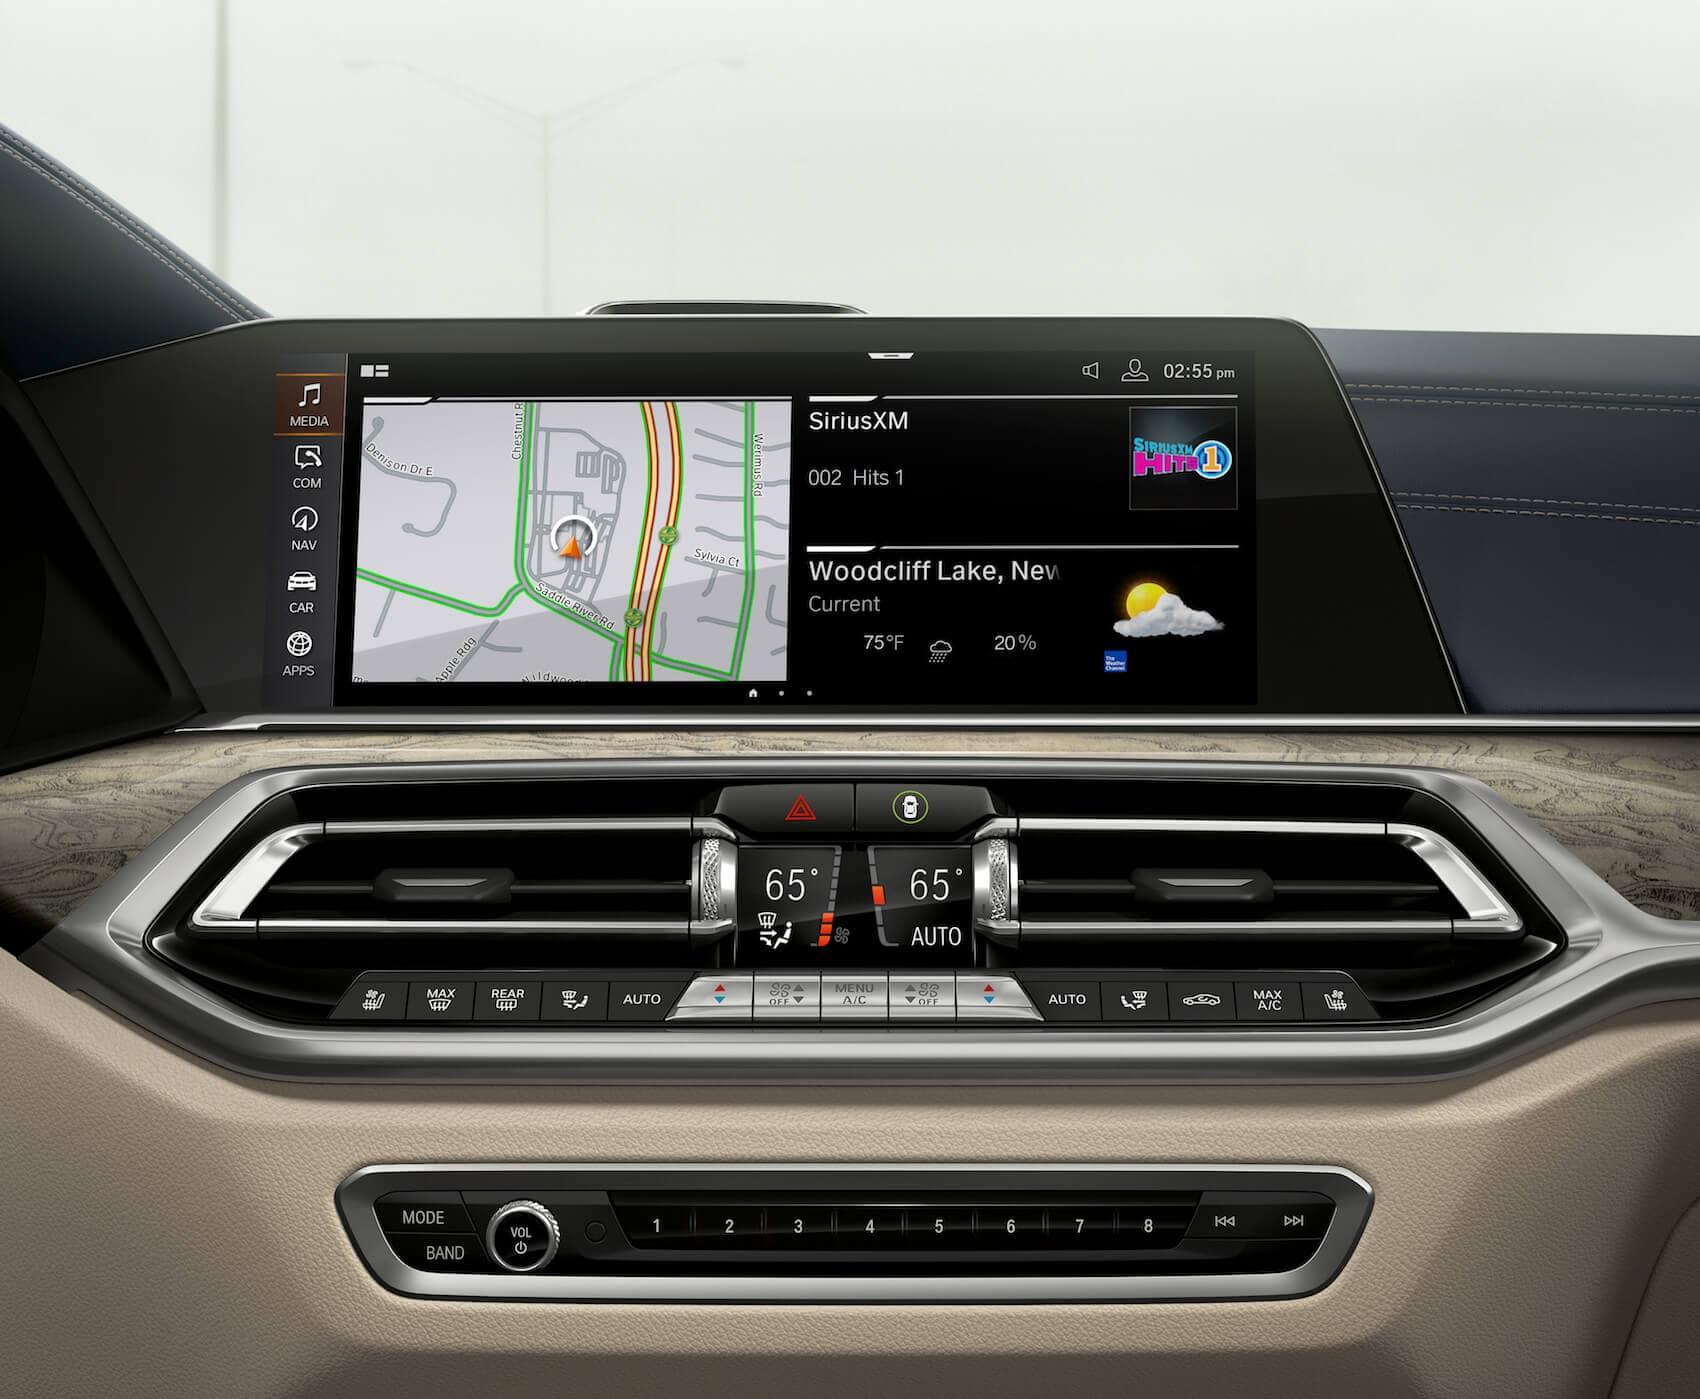 2020 BMW X7 technology Hilton Head, SC